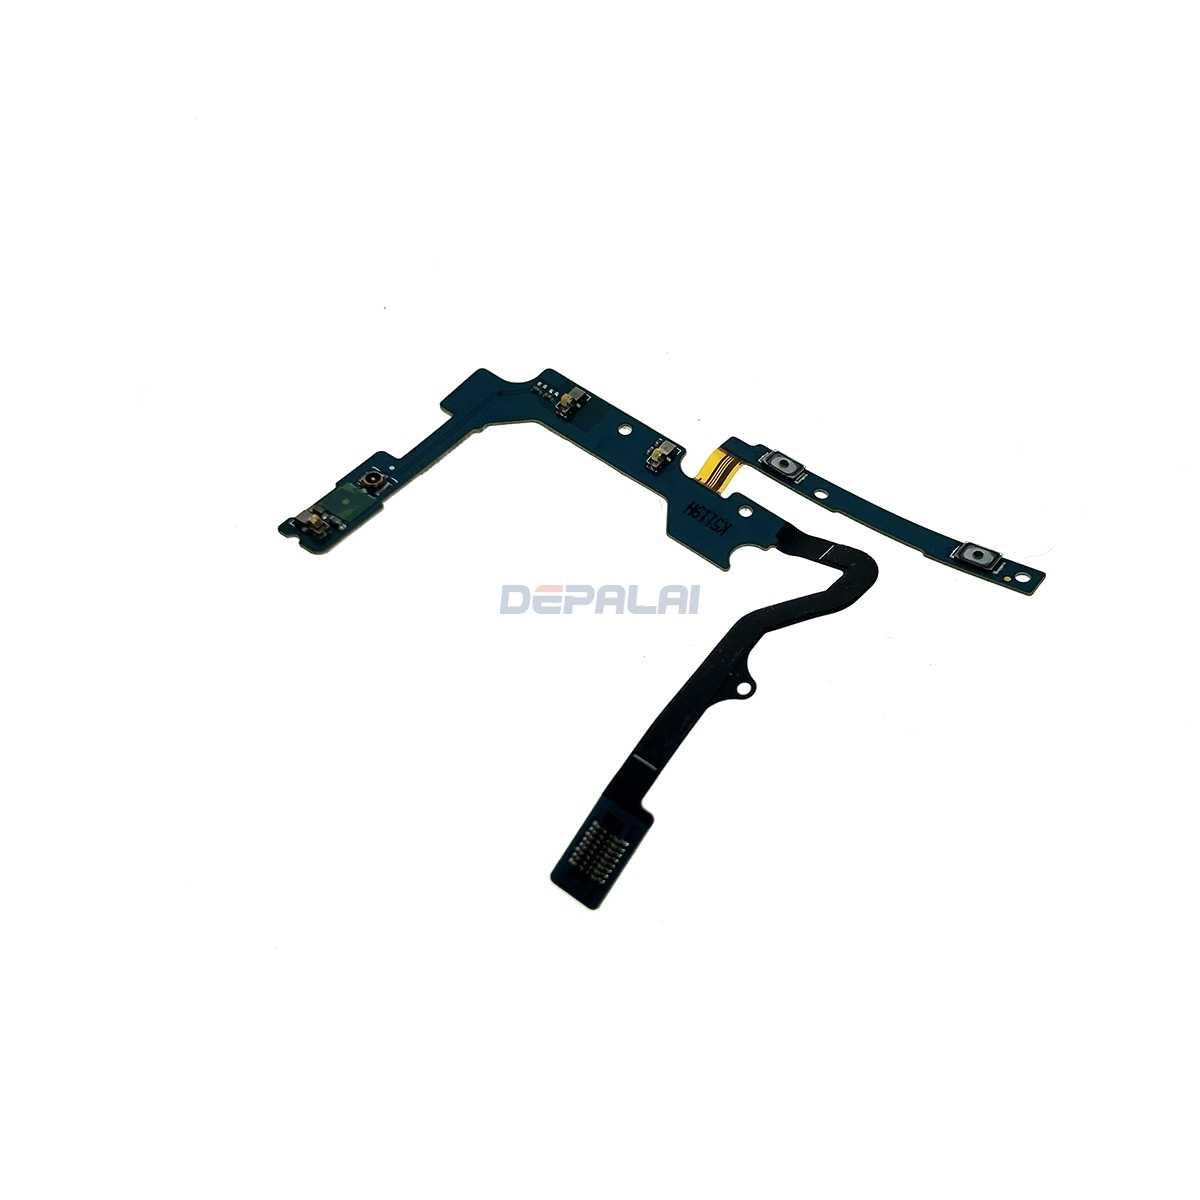 Kabel Tombol Volume Fleksibel untuk Samsung Galaxy A5 A5000 A5009 Suku Cadang